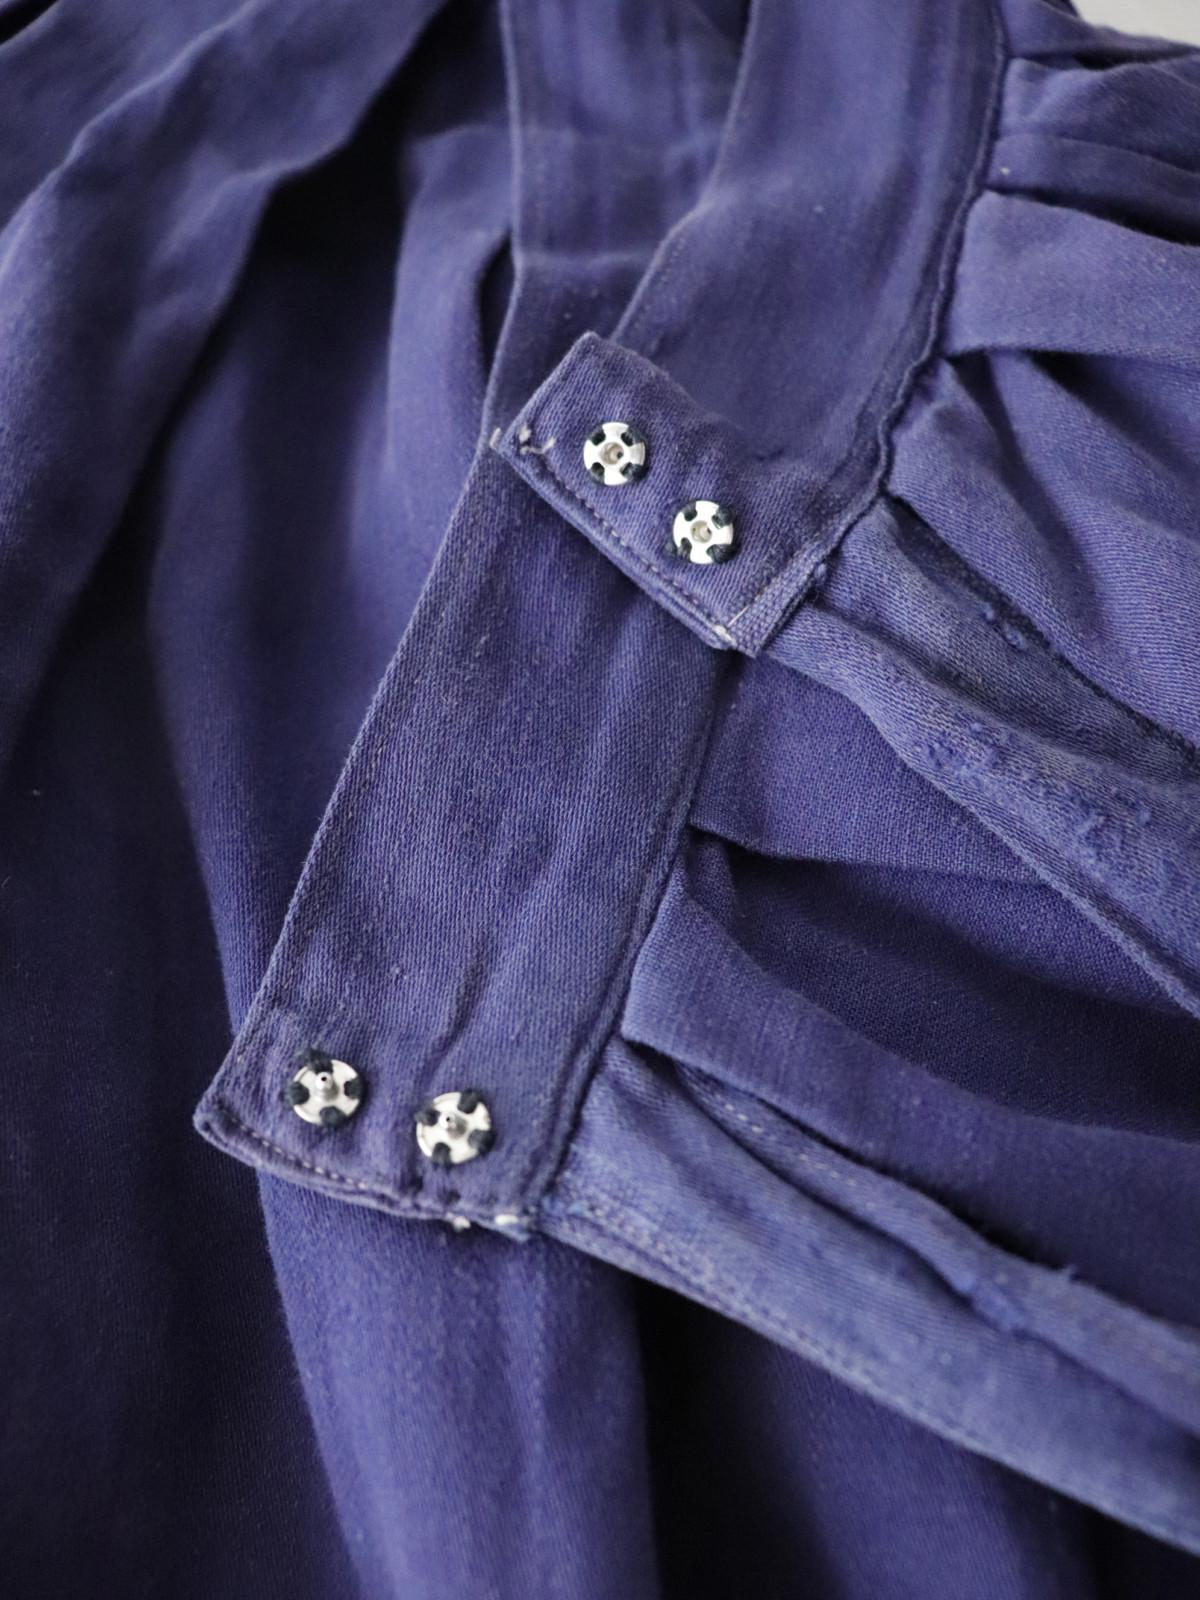 culotte pants, USA, vintage,